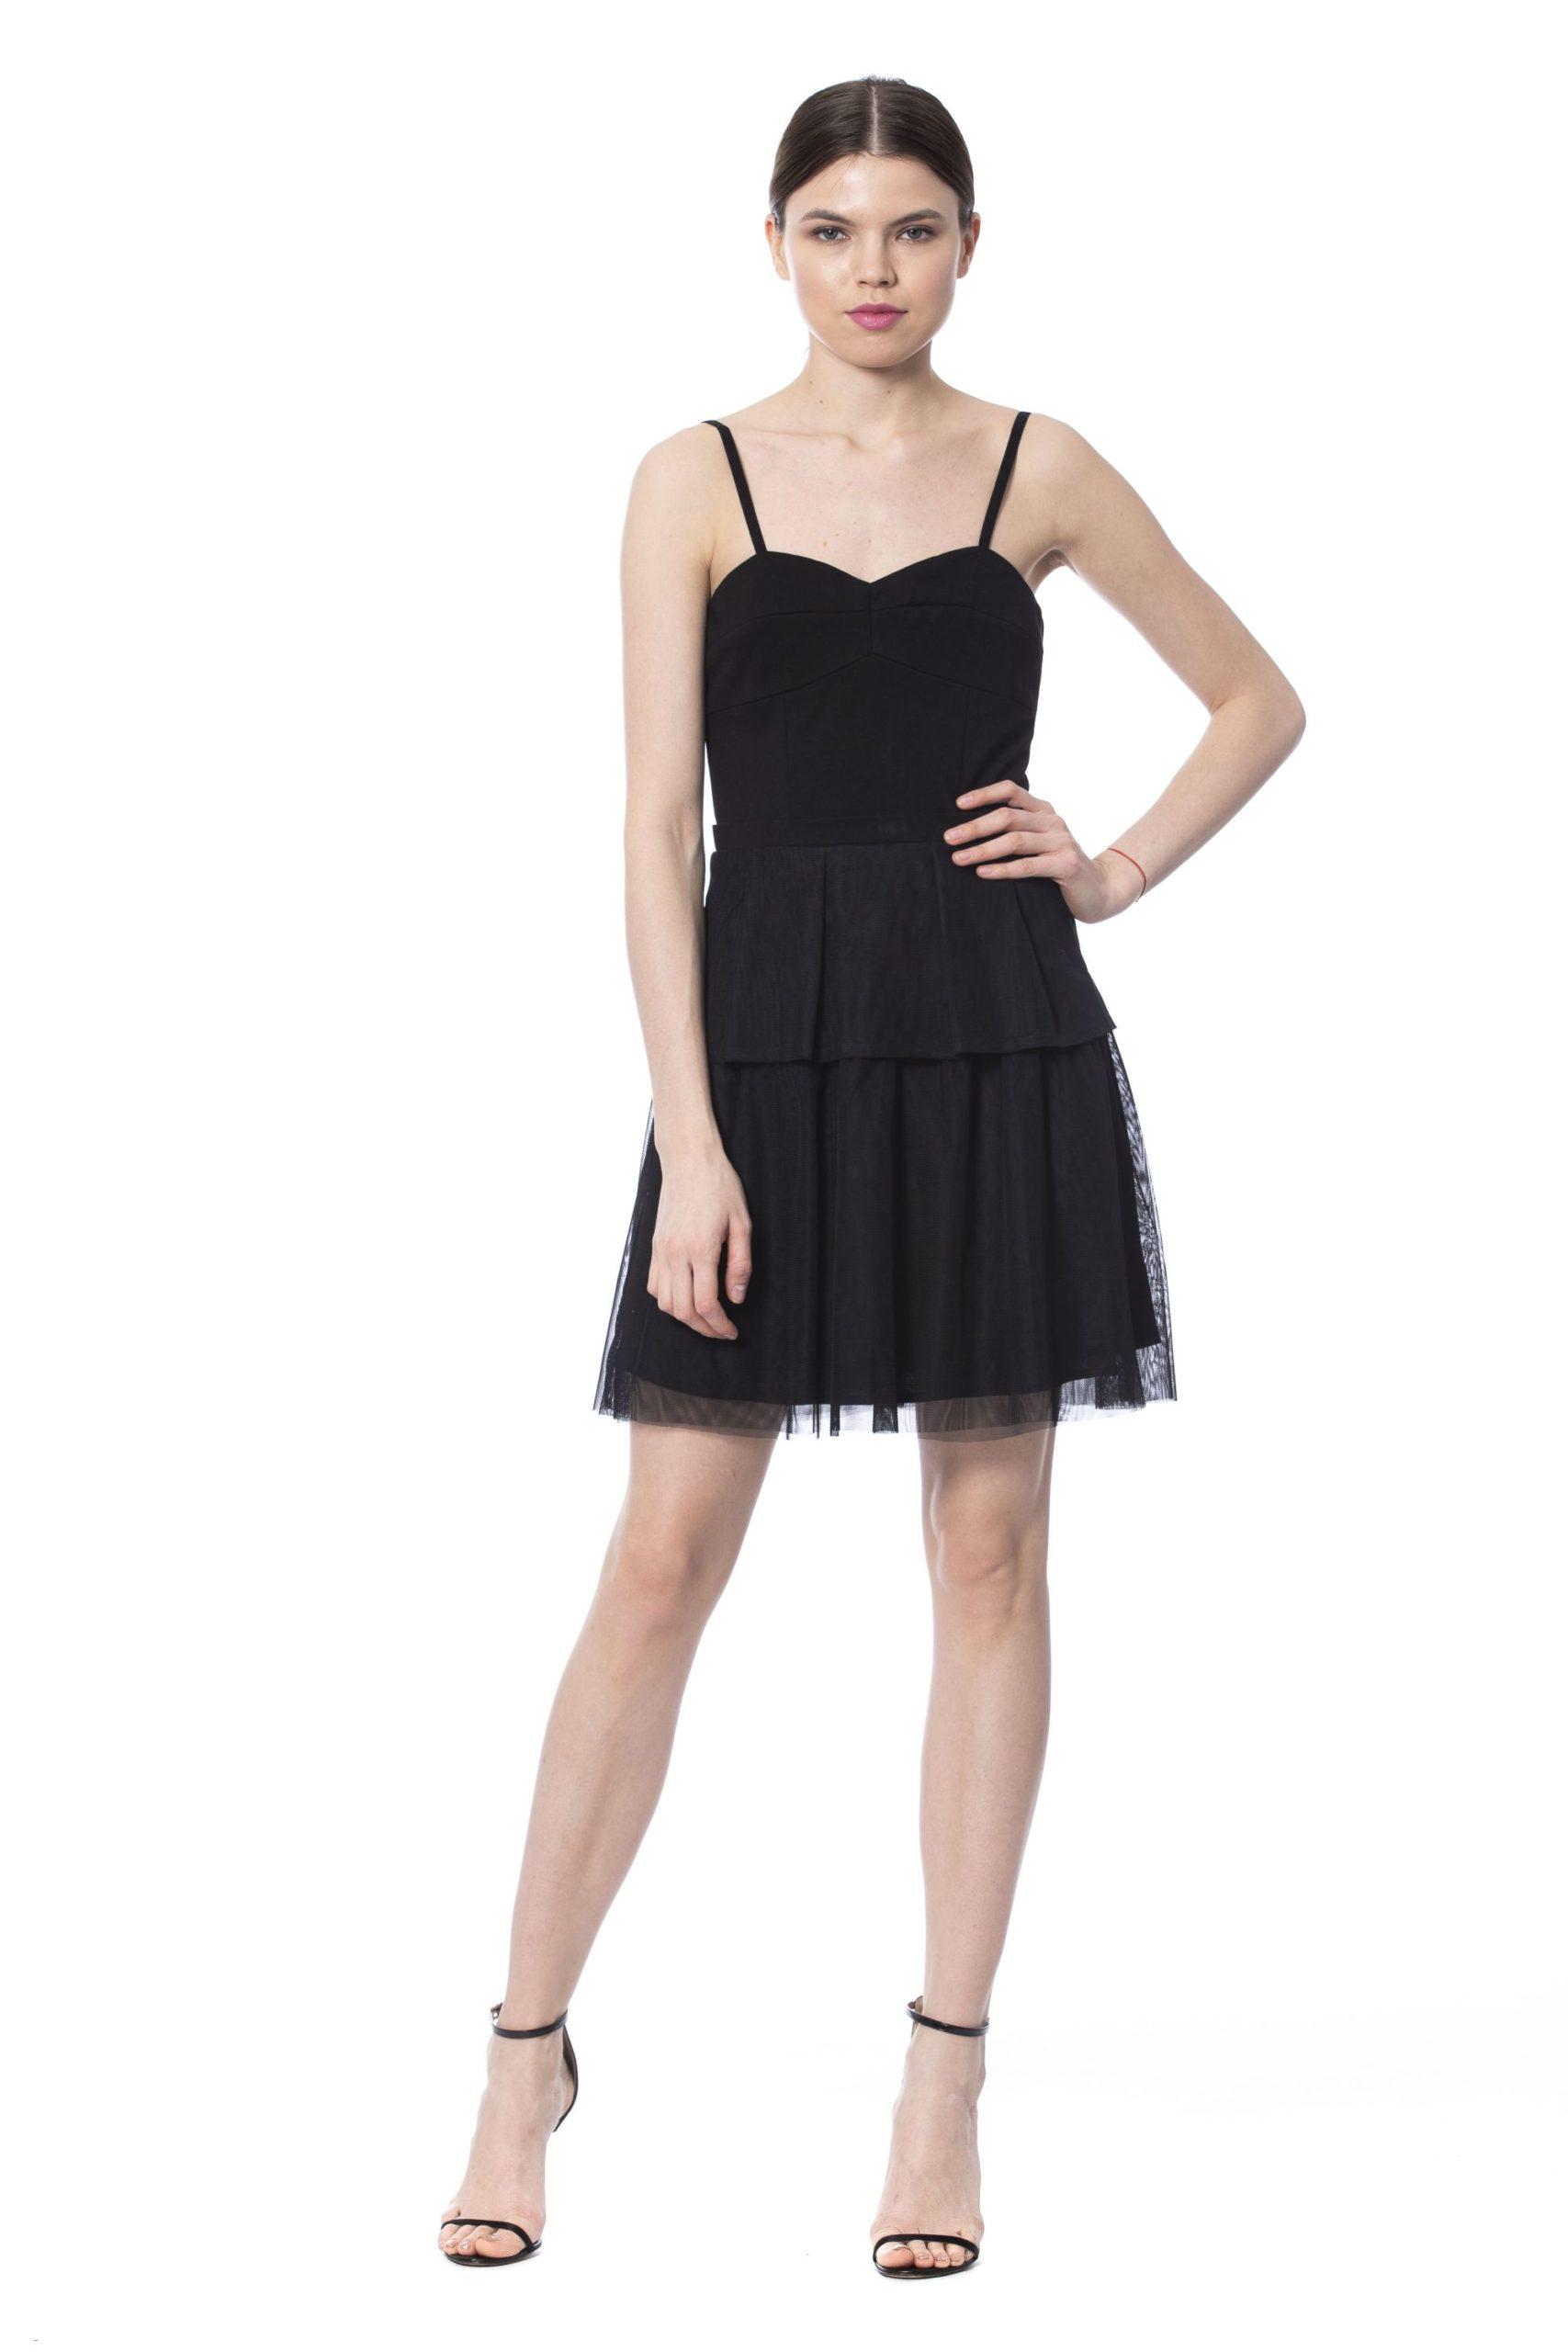 Silvian Heach Women's Dress Black SI996472 - L